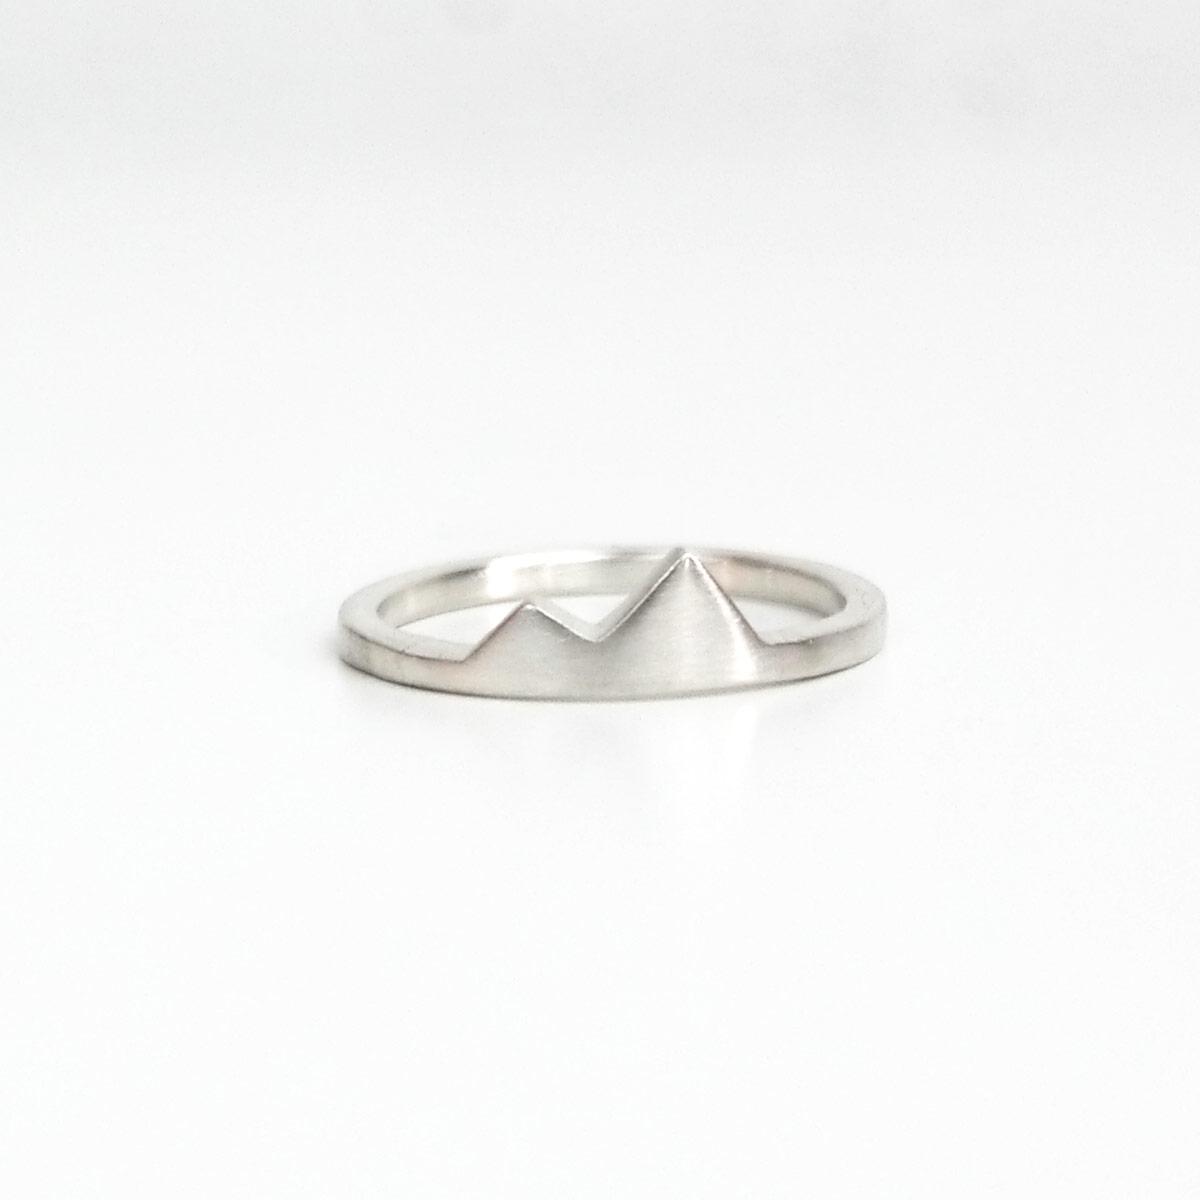 Best Friend Ring, Mountain Ring, Silver Ring, Wanderlust, Dainty ...